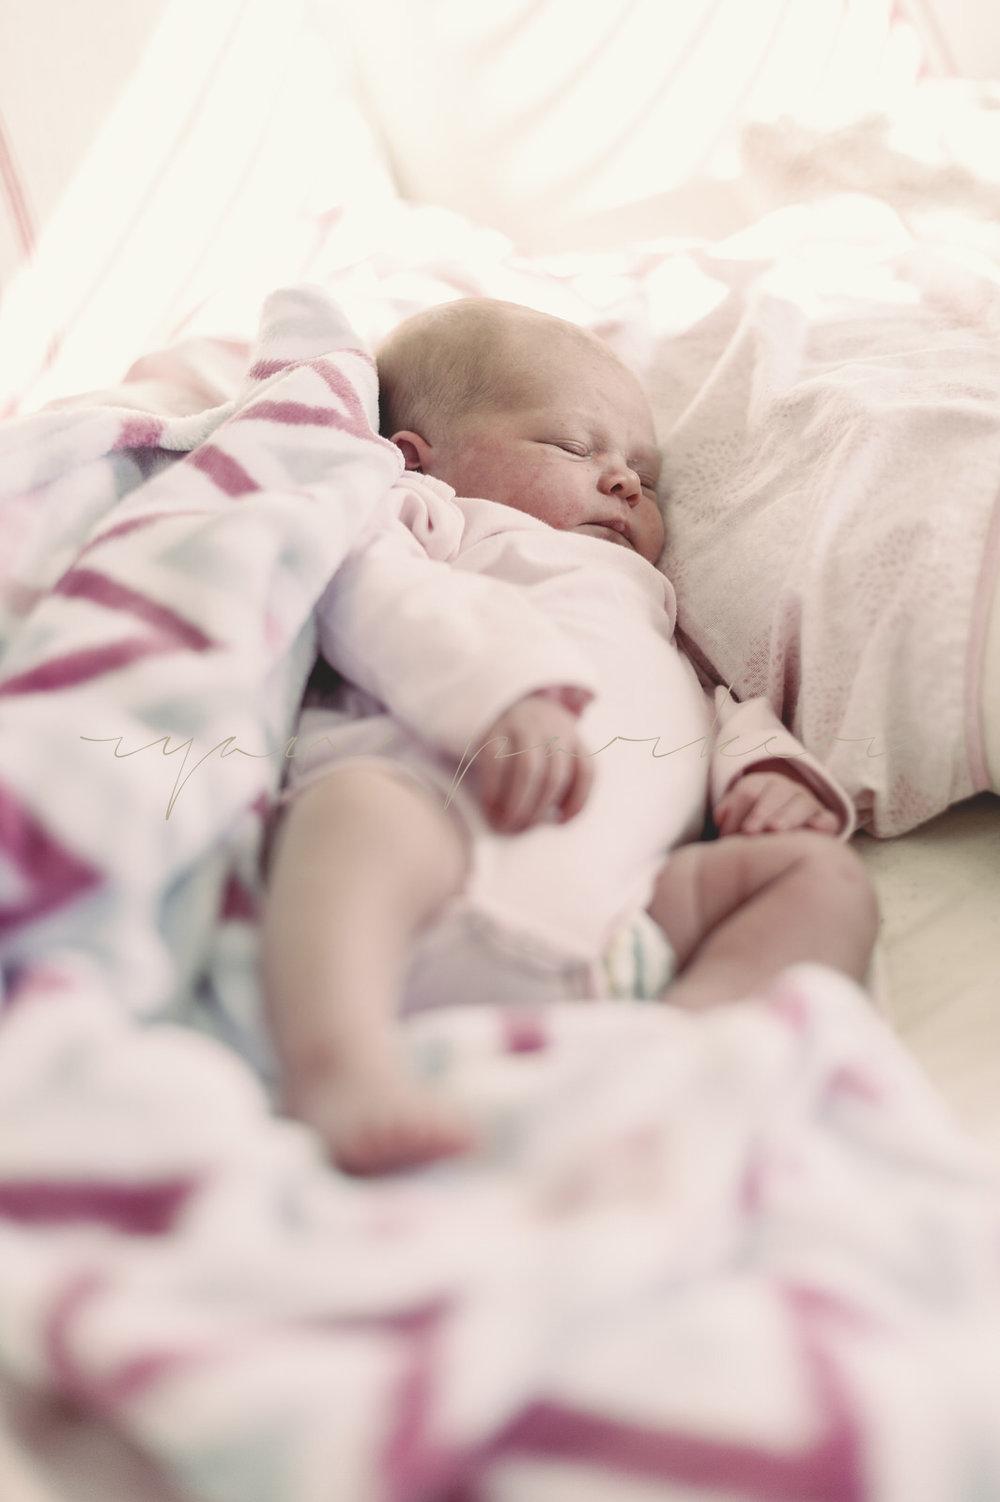 RyanParker_Lifestyle_Photographer_CapeTown_Hermanus_Baby_TP_DSC_0877.jpg